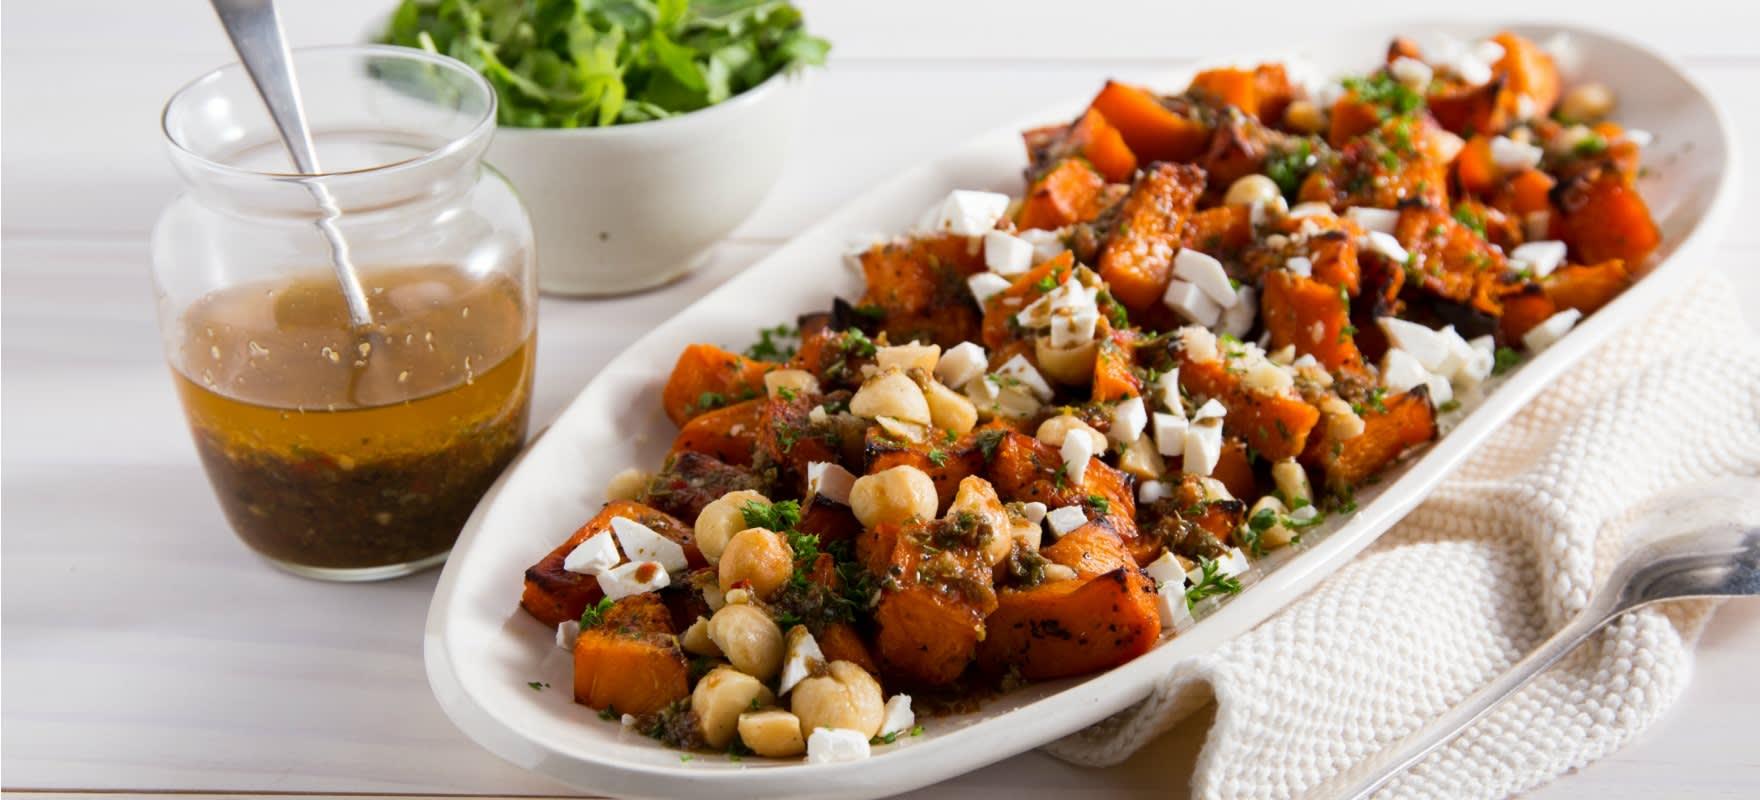 Roast pumpkin and macadamia salad image 1